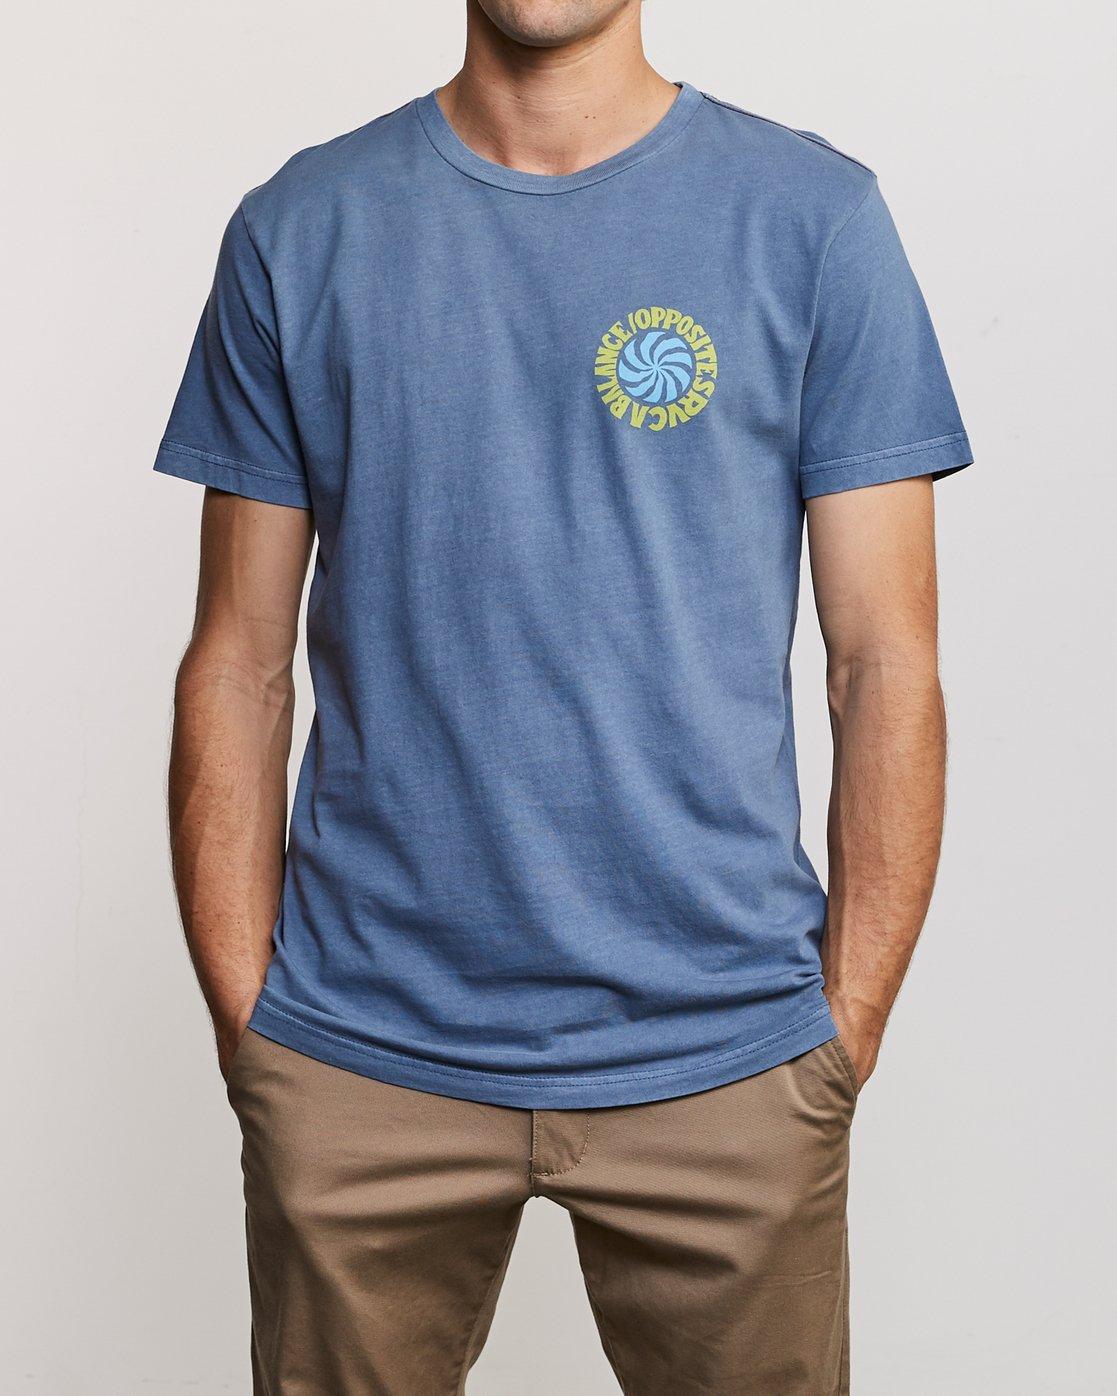 2 DMOTE Rvcafied T-Shirt Blue M438URRV RVCA